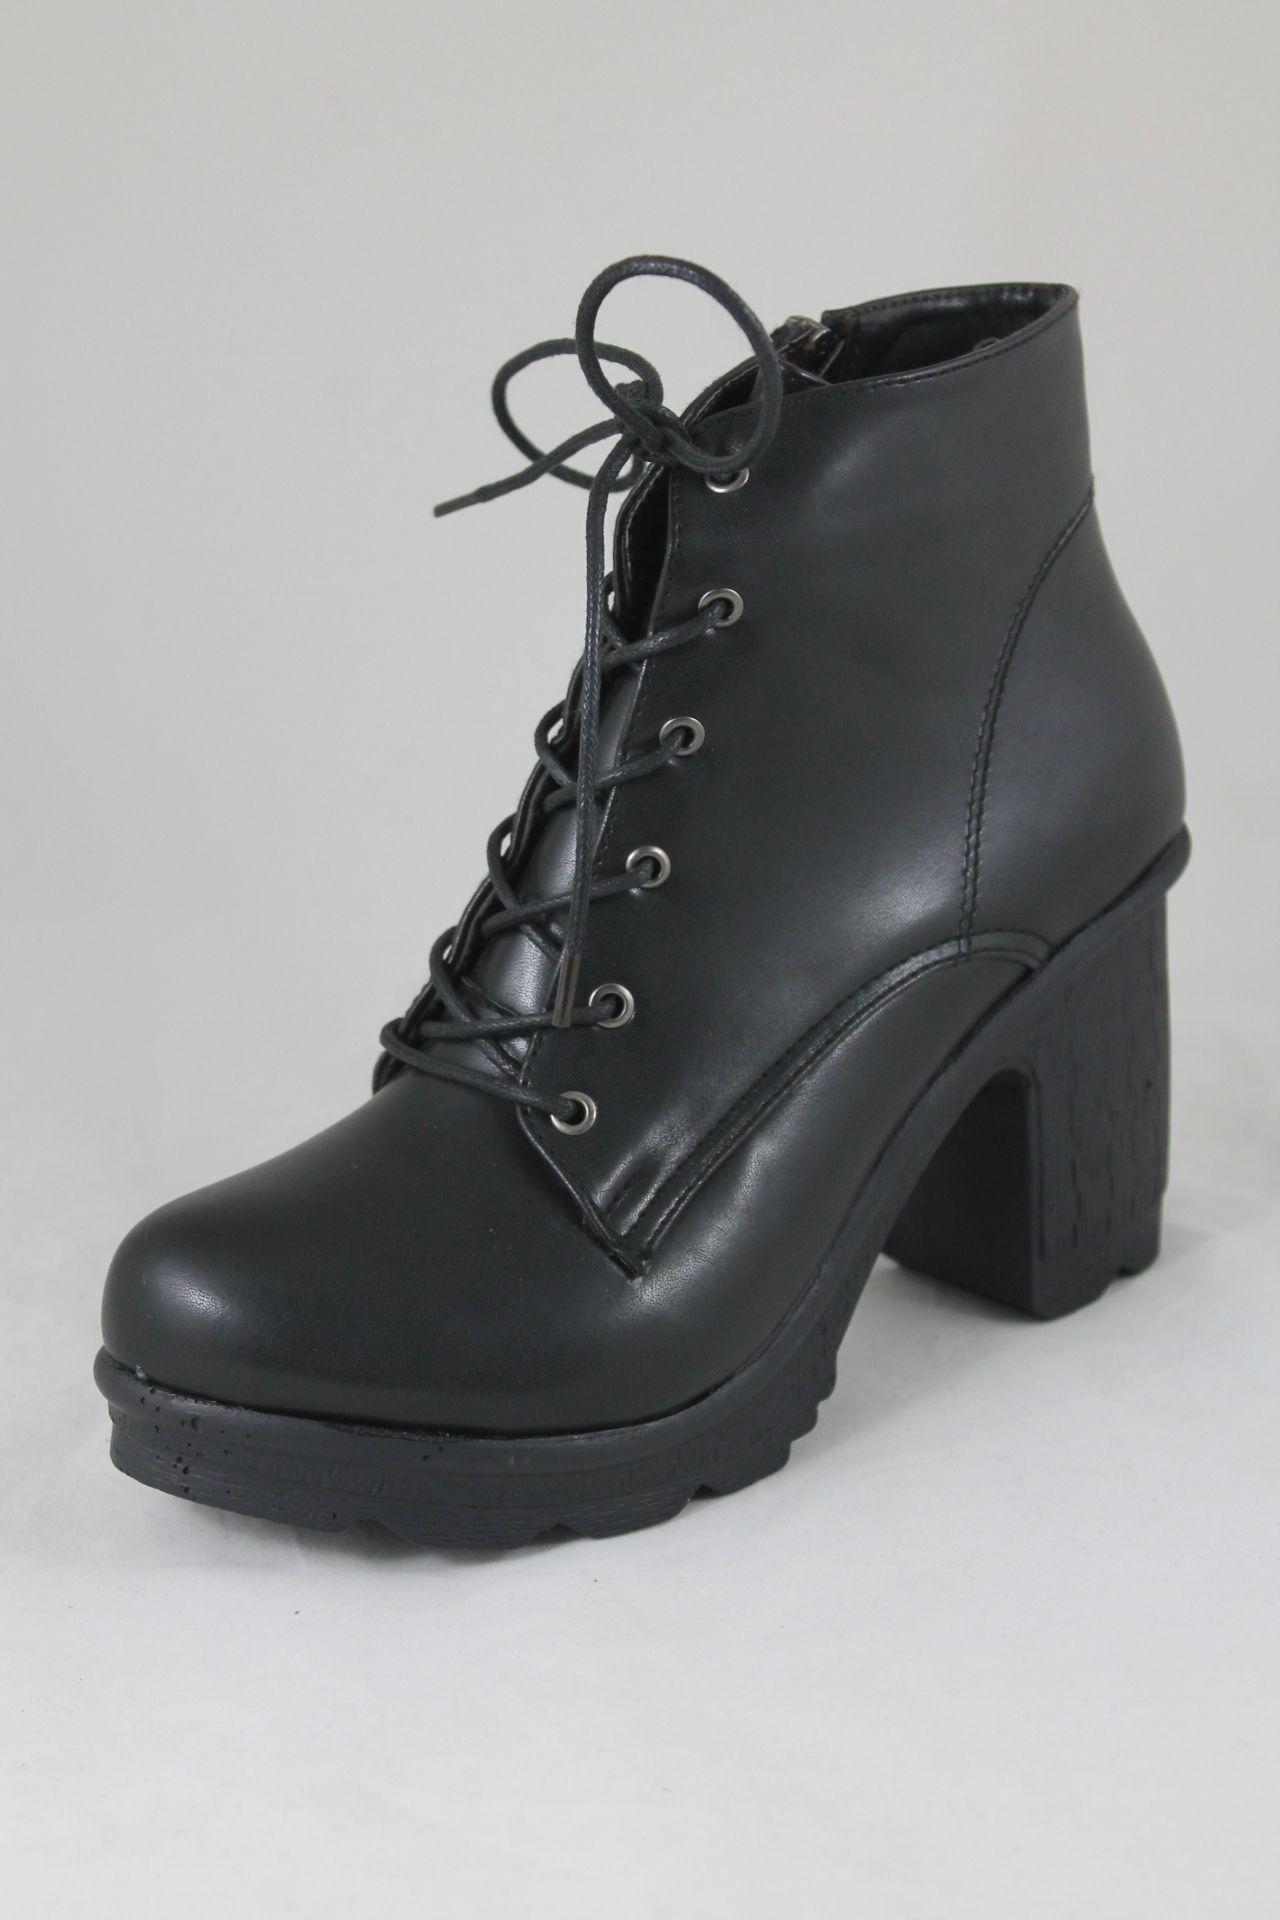 da4575b17581a سعر Shoebox حذاء كلاسيك بكعب عالي جلد - اسود فى مصر